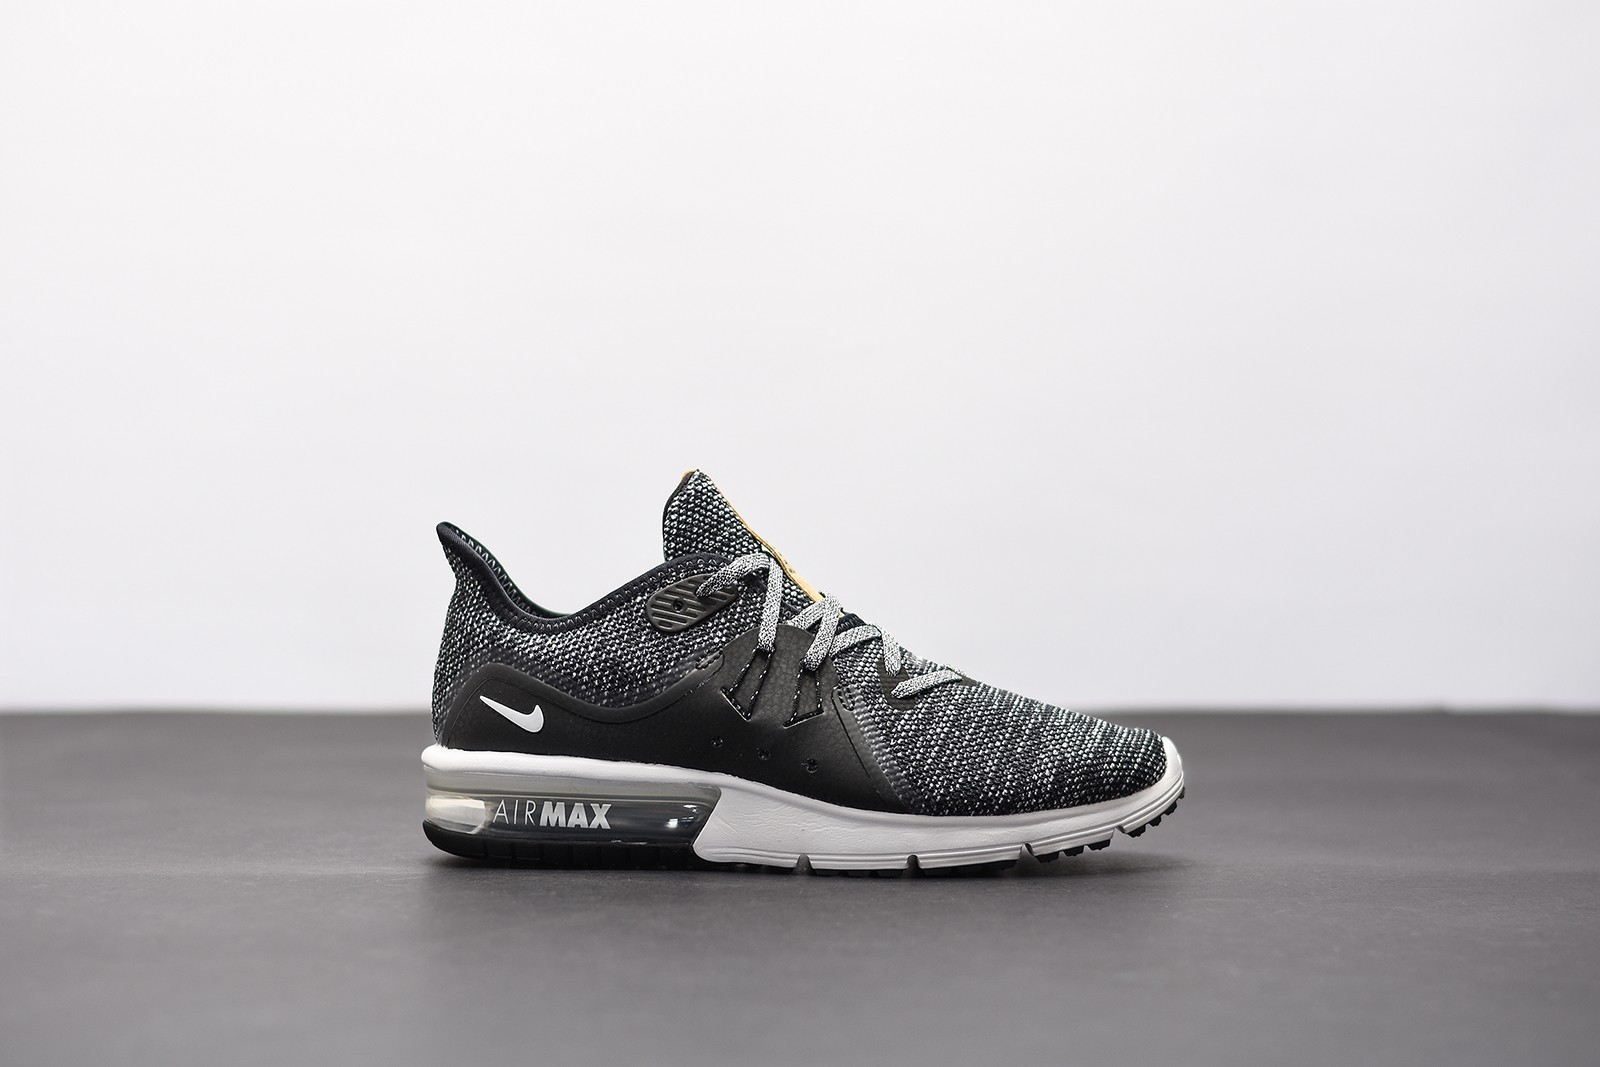 c2f077aa1eb4 Dámské Tenisky Nike WMNS AIR MAX SEQUENT 3